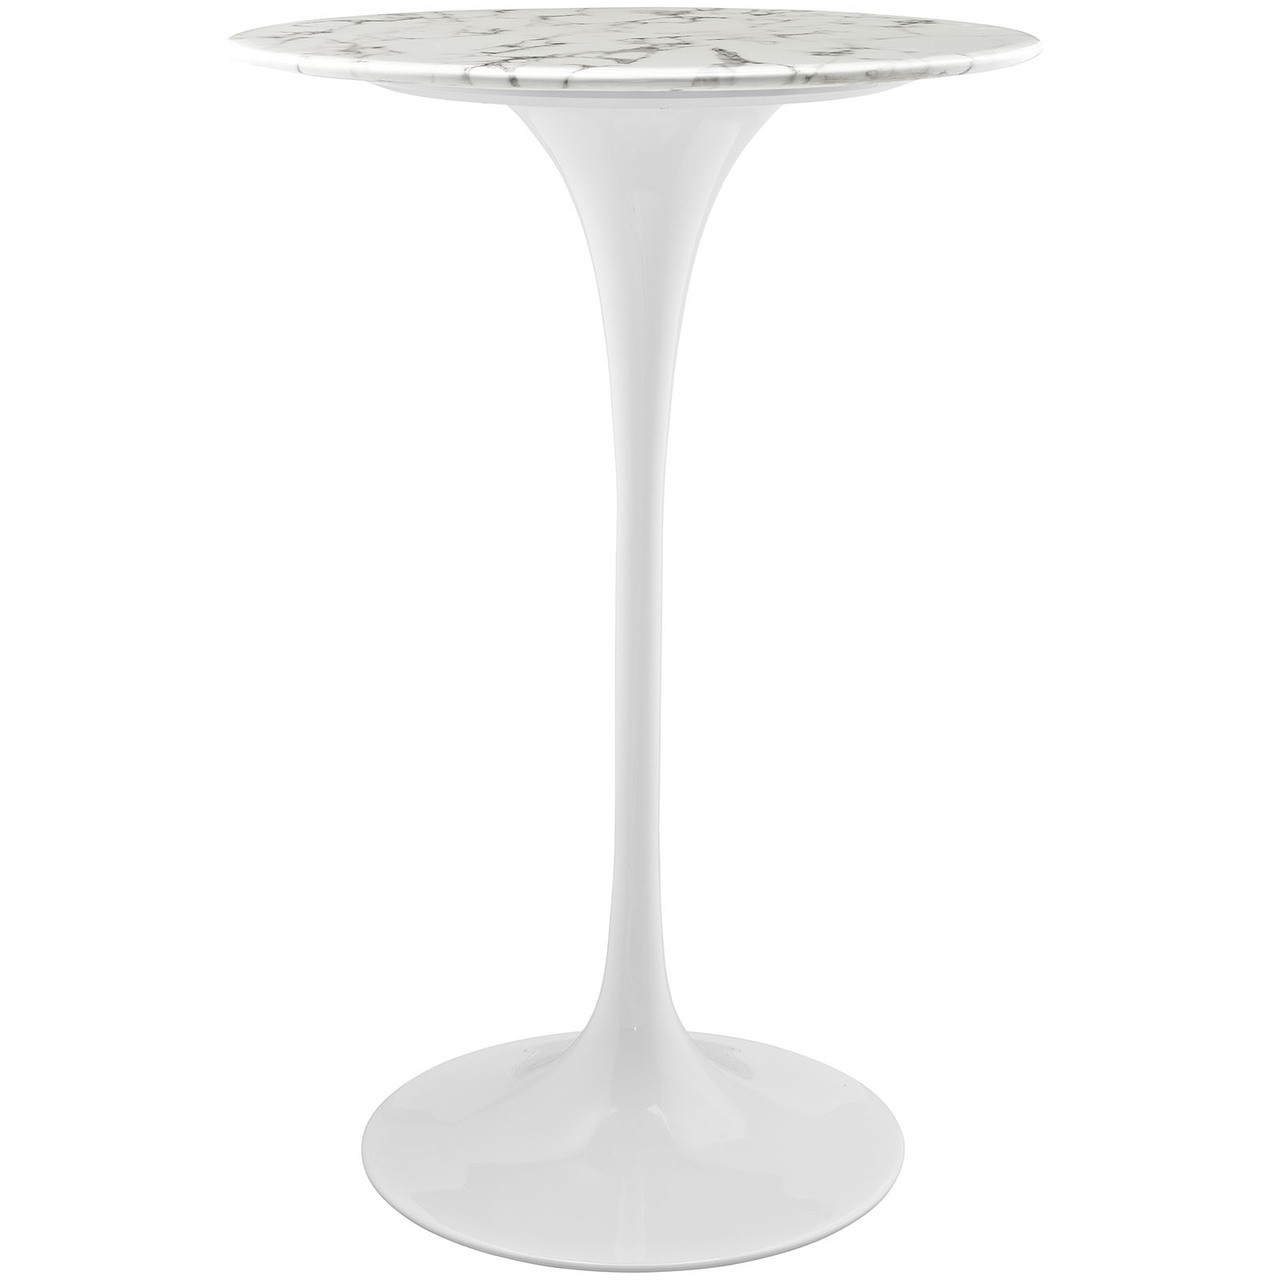 "Lippa 28"" Artificial Marble Bar Table"